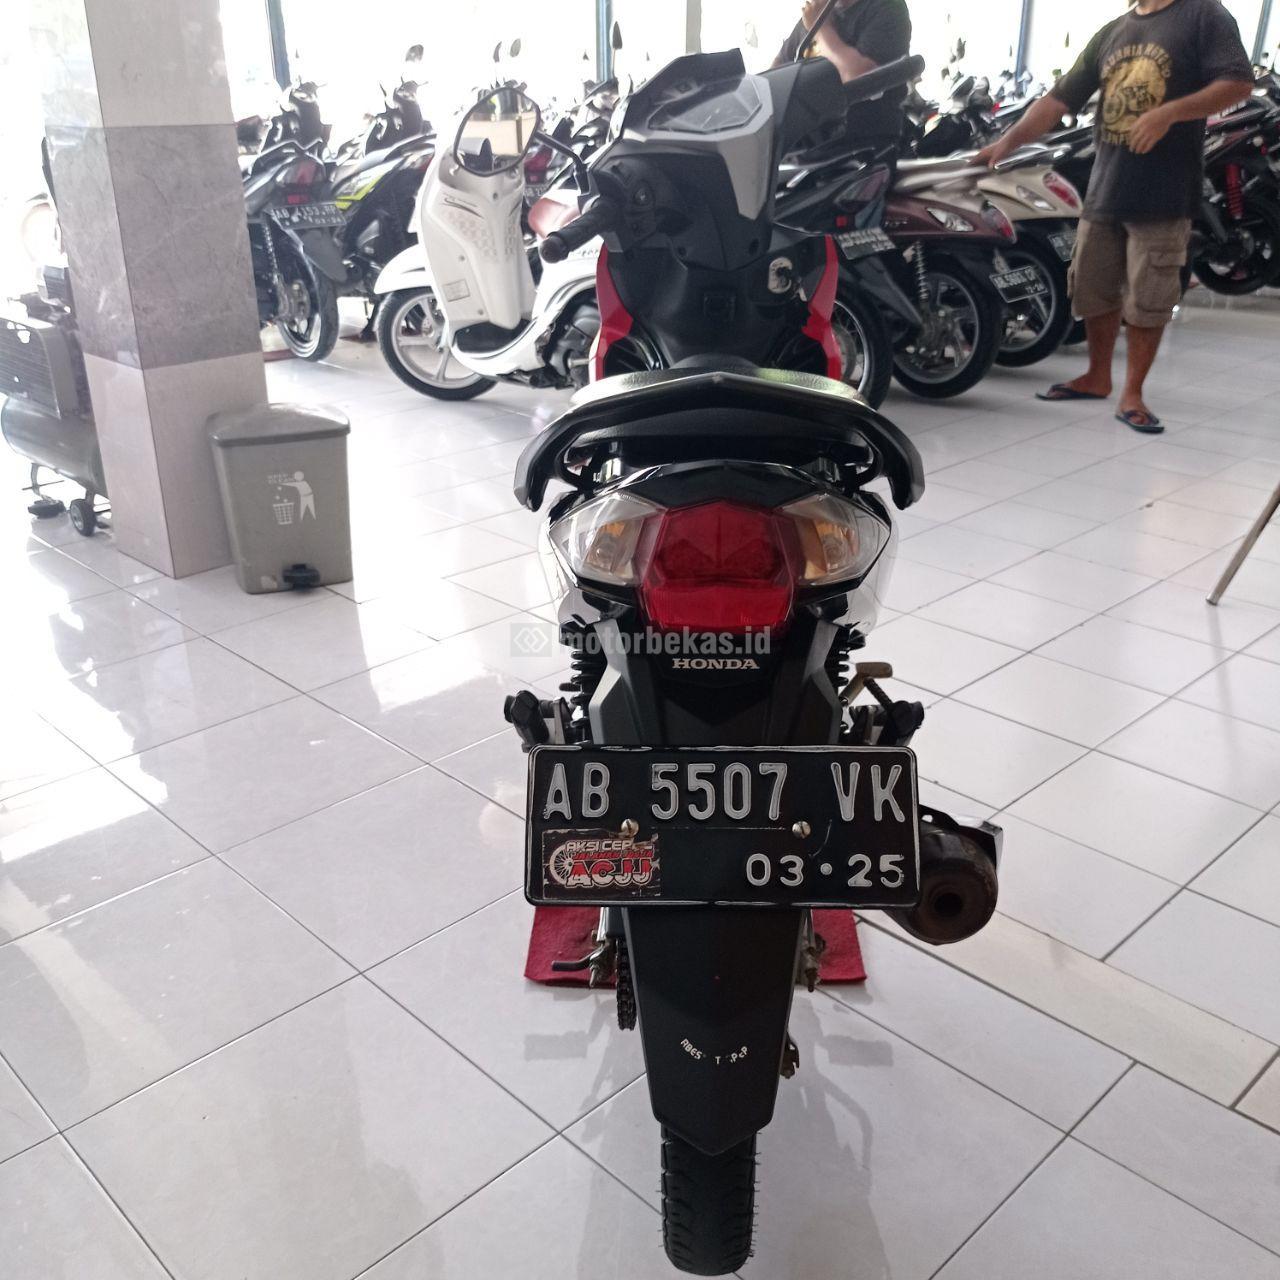 HONDA SUPRA X 125  387 motorbekas.id